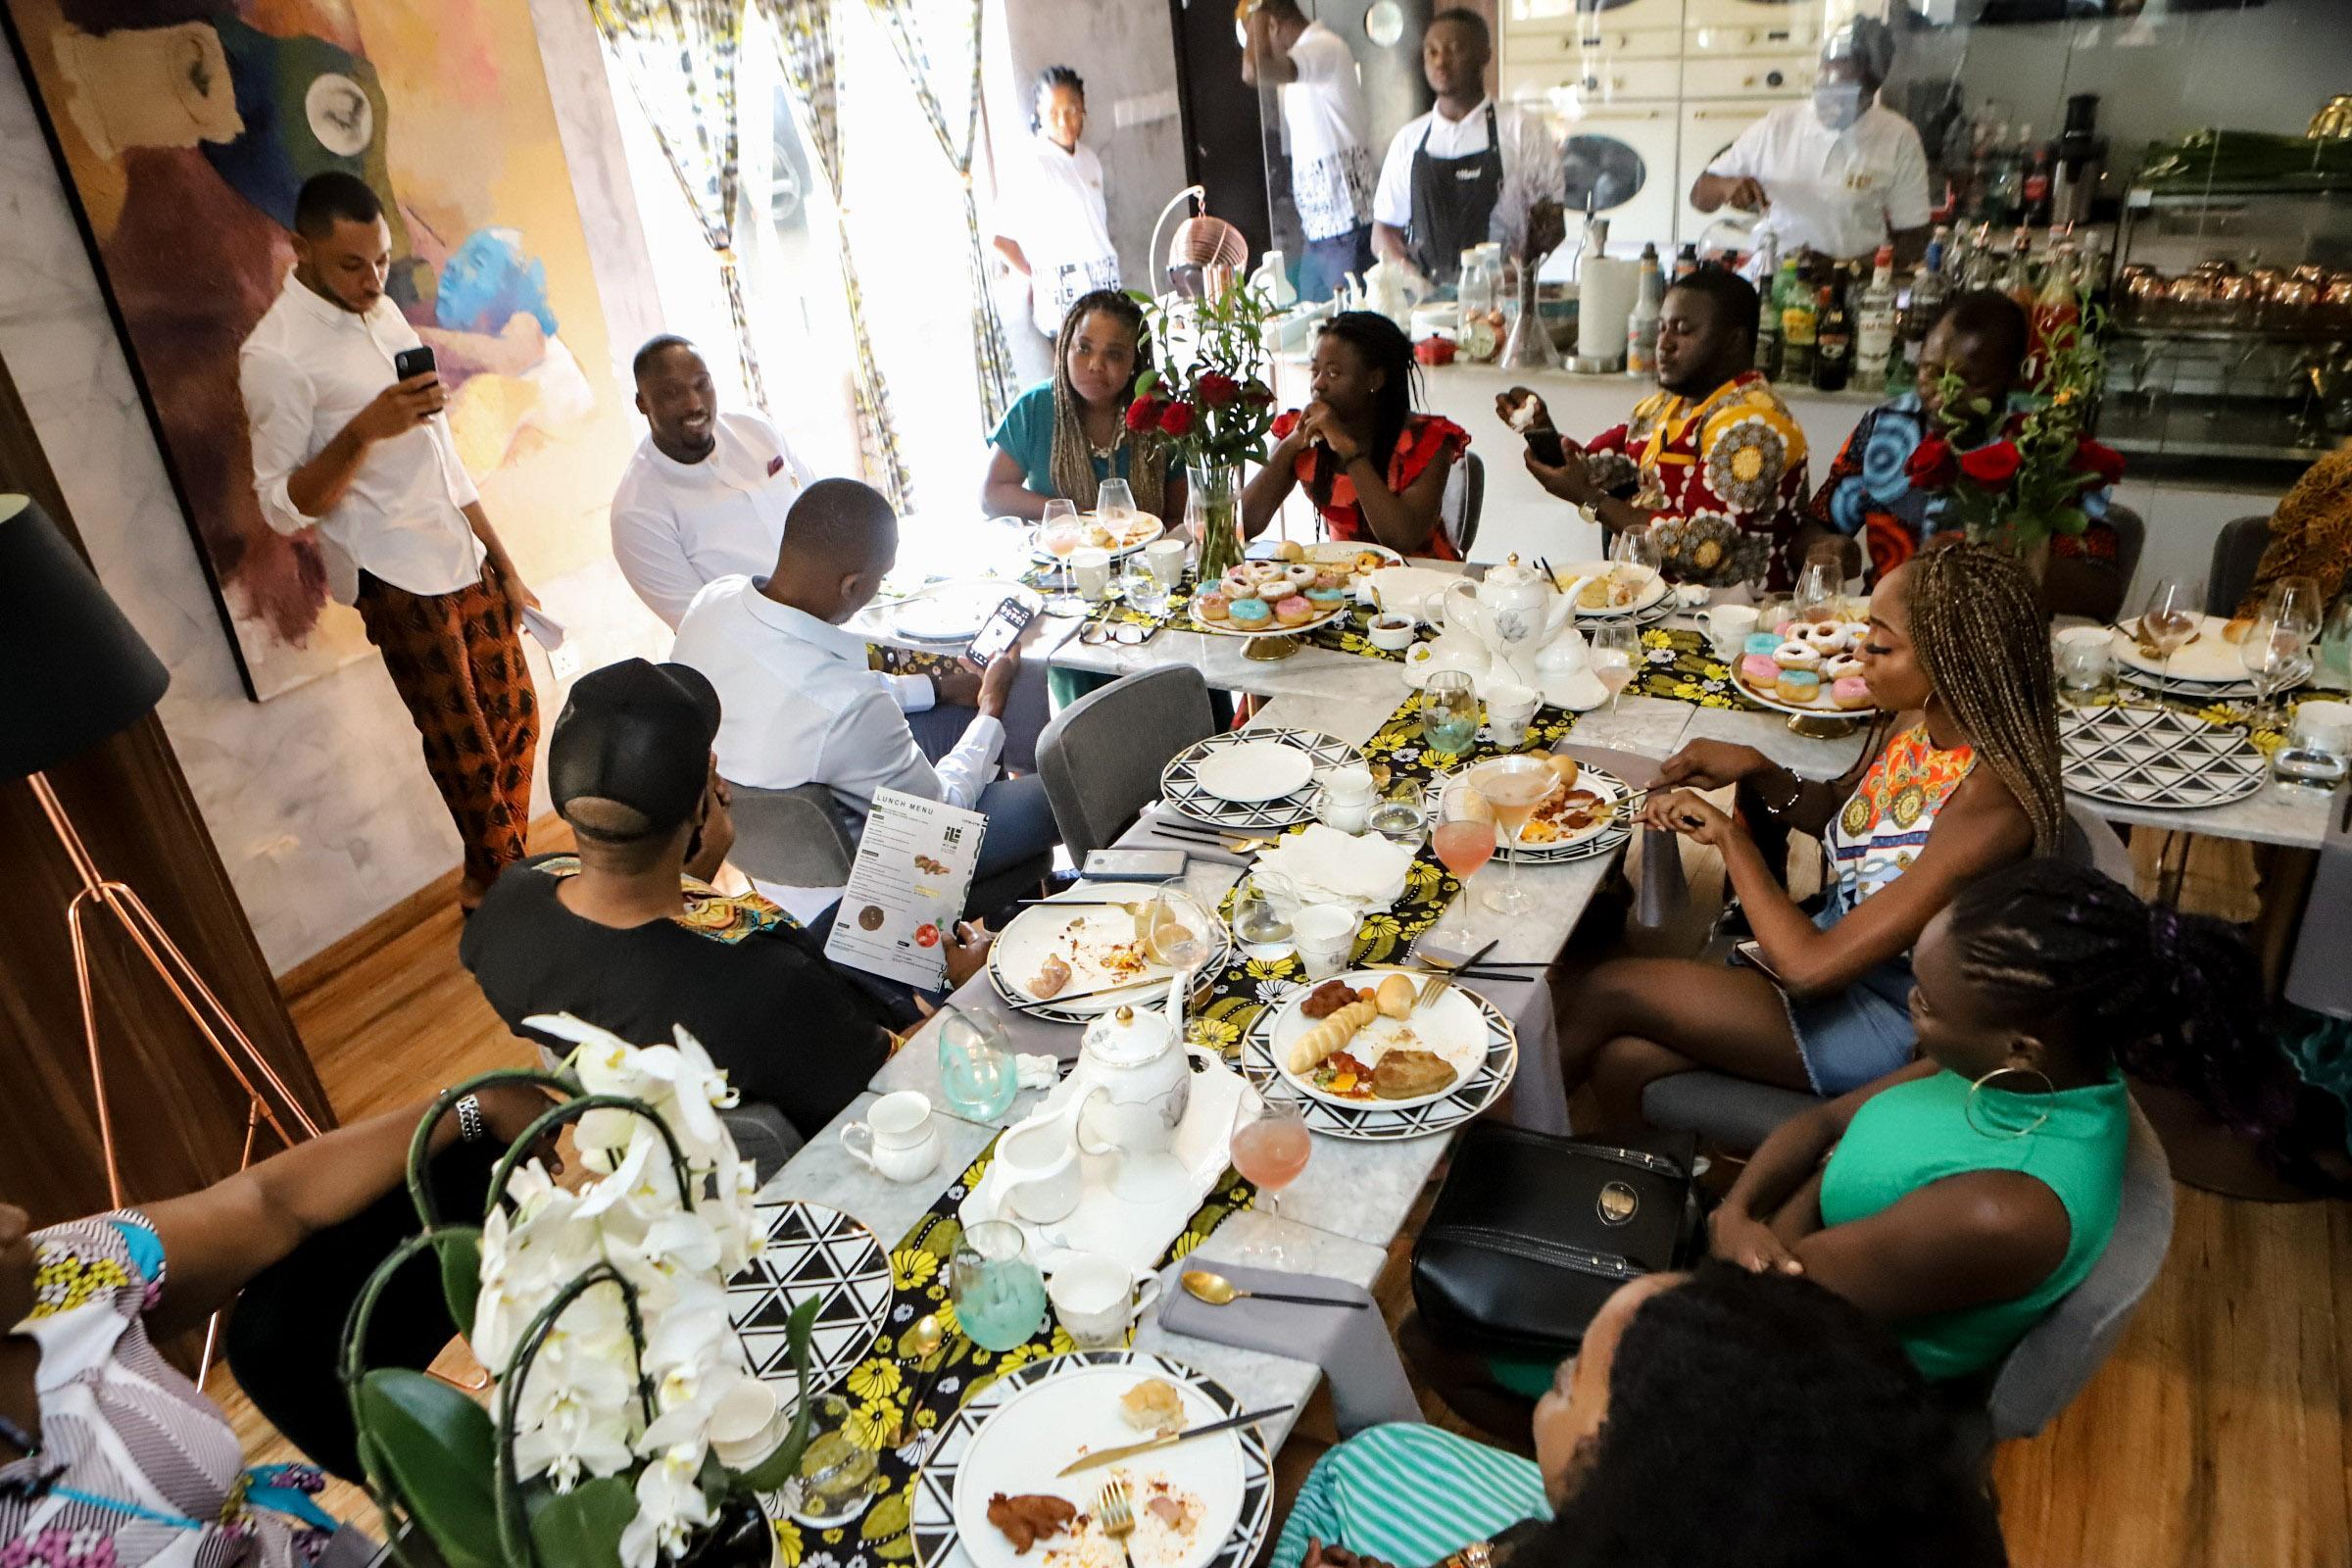 Fine Dining Experiences Await Lagos As Ilé Eros Launches Premium Restaurant (Photos)